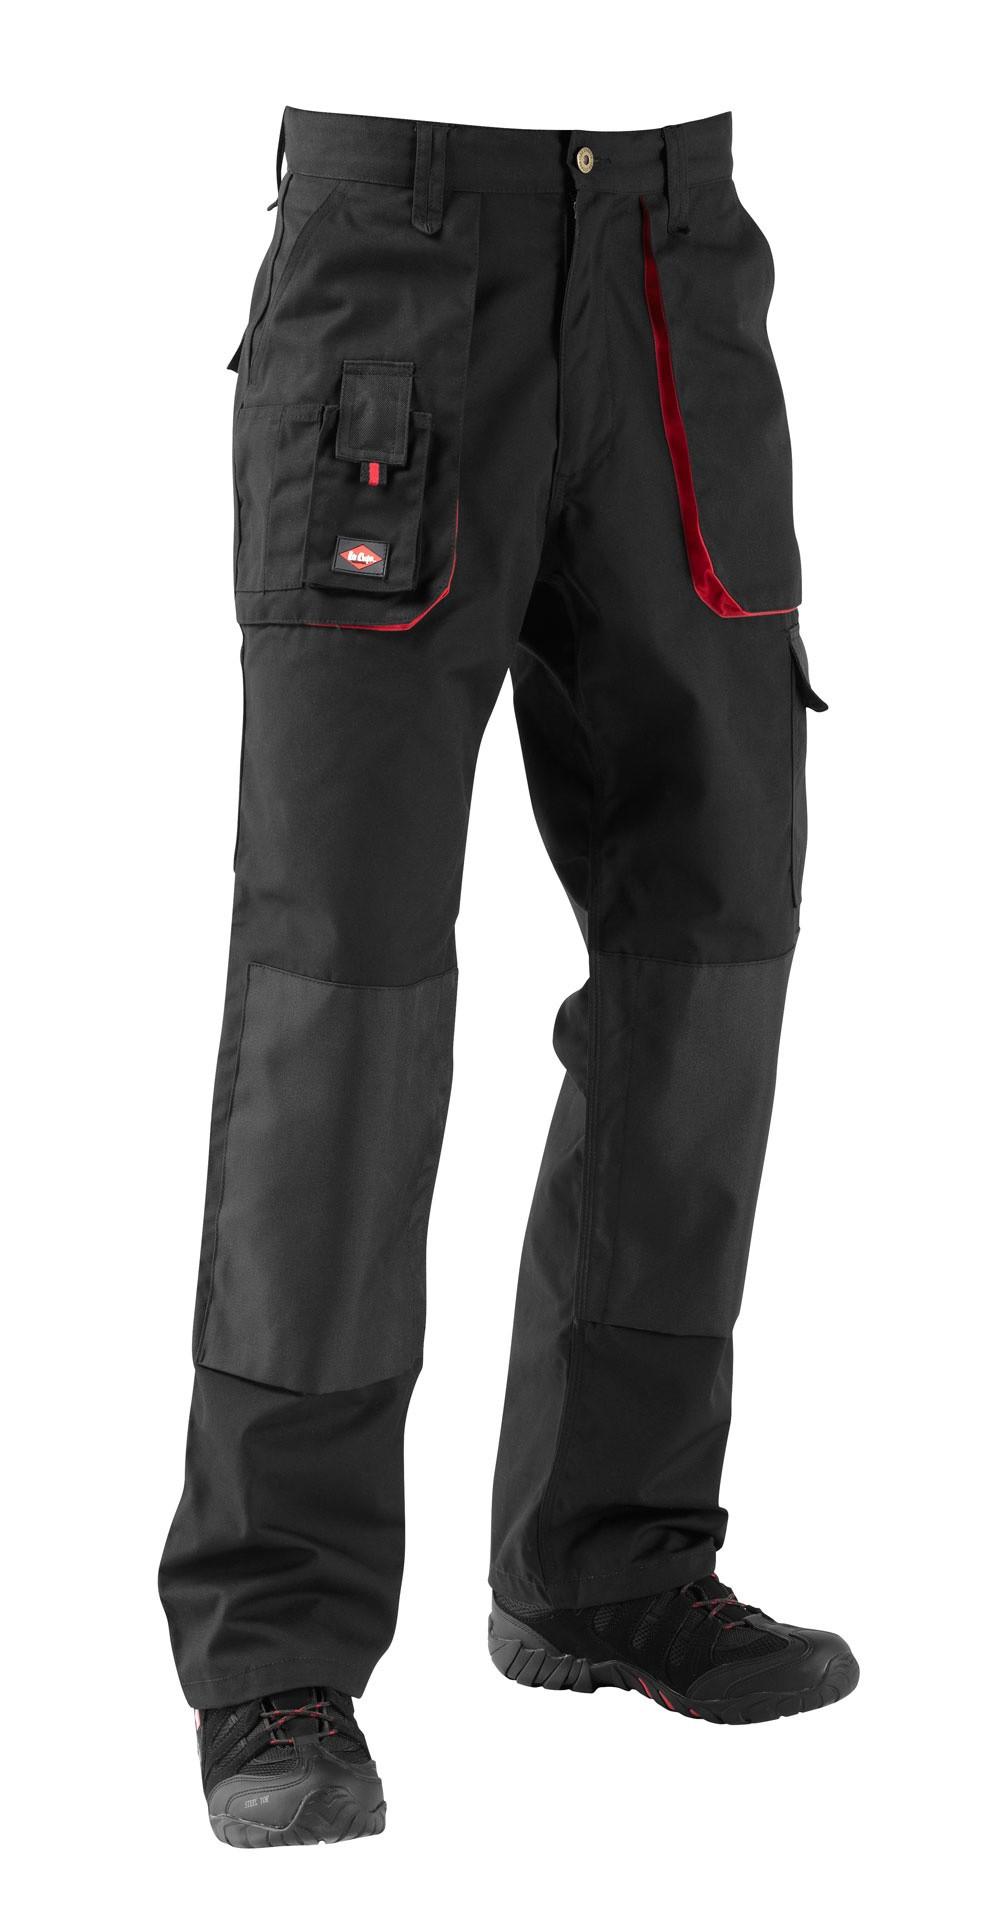 213 two colour cargo trouser